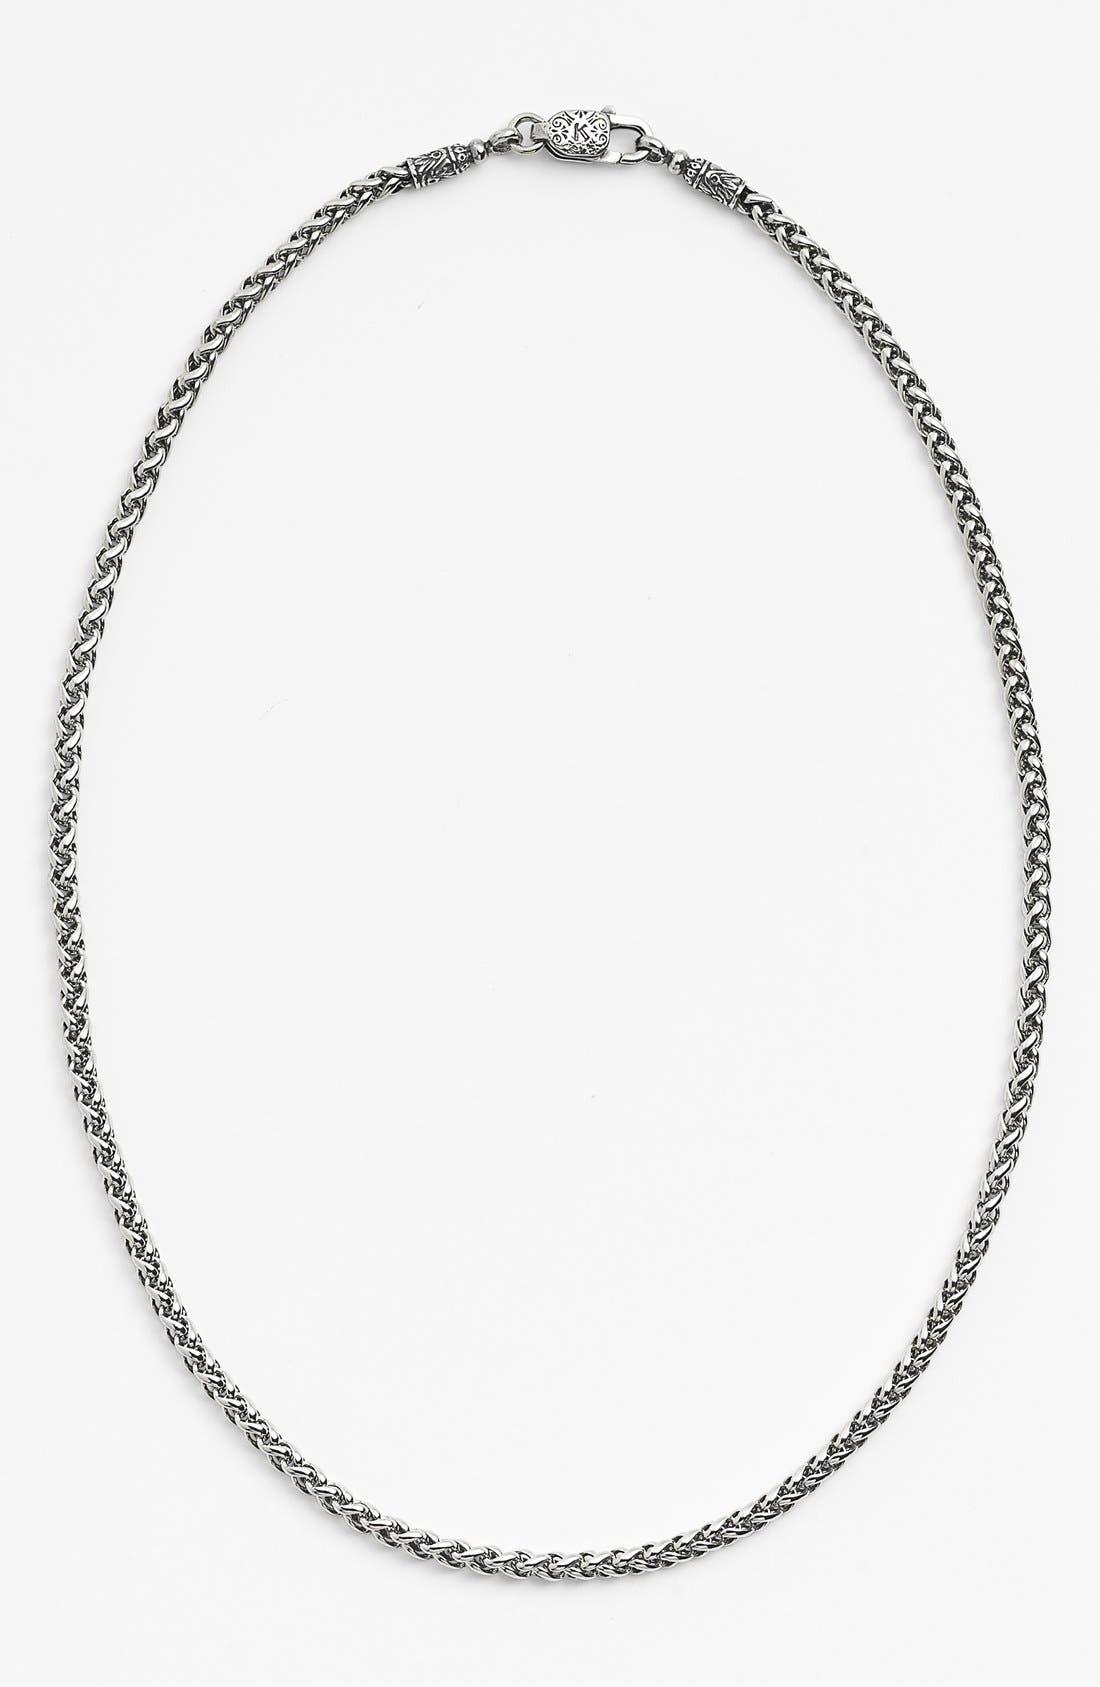 Main Image - Konstantino 'Classics' Link Necklace